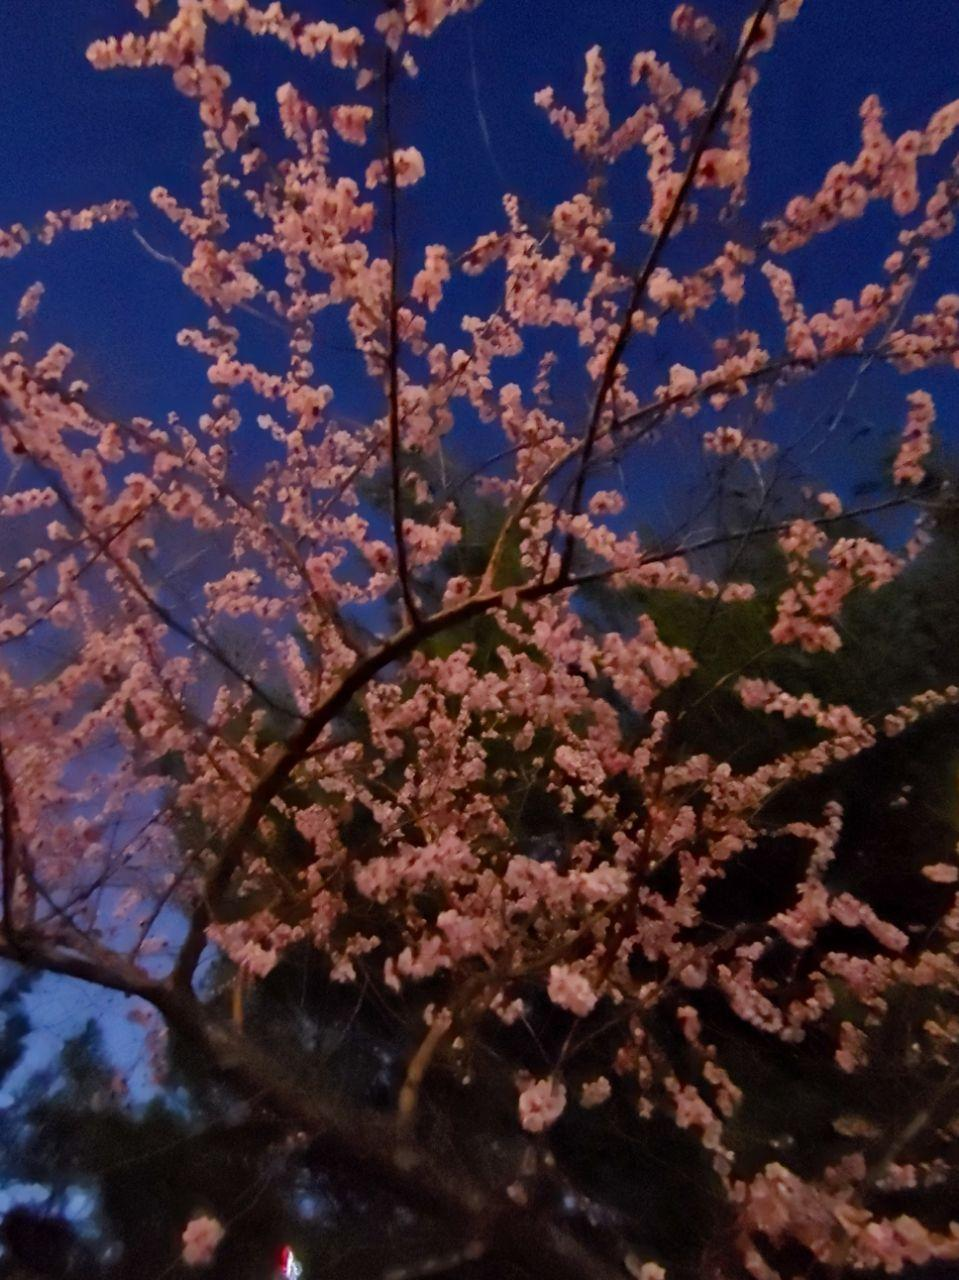 photo_2020-03-22_22-09-18.jpg